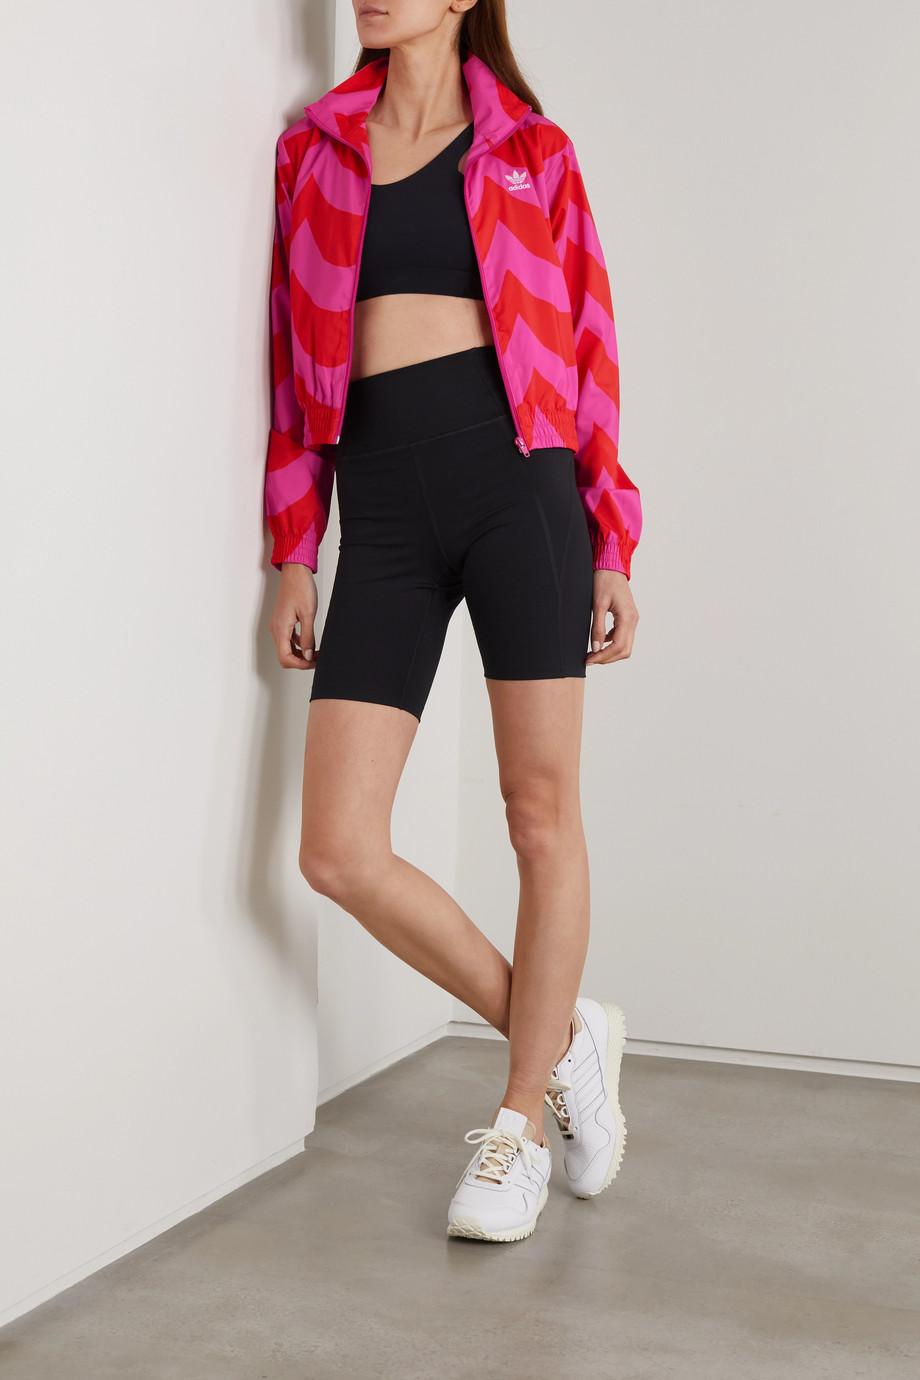 adidas Originals + Marimekko Primegreen Trainingsjacke mit Print